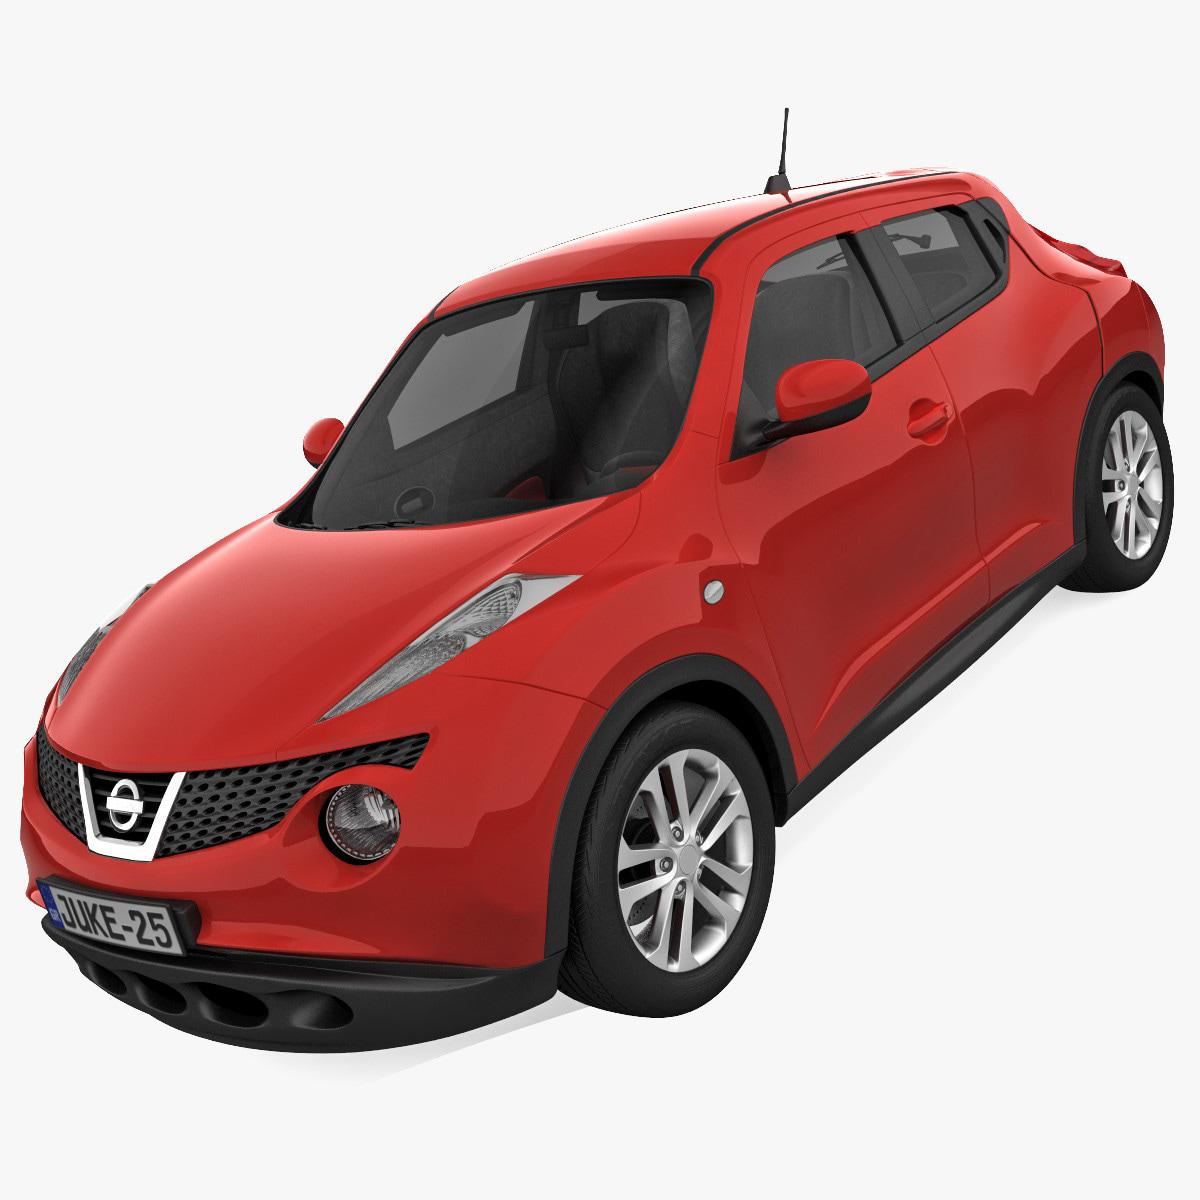 Nissan_Juke_00_1.jpg